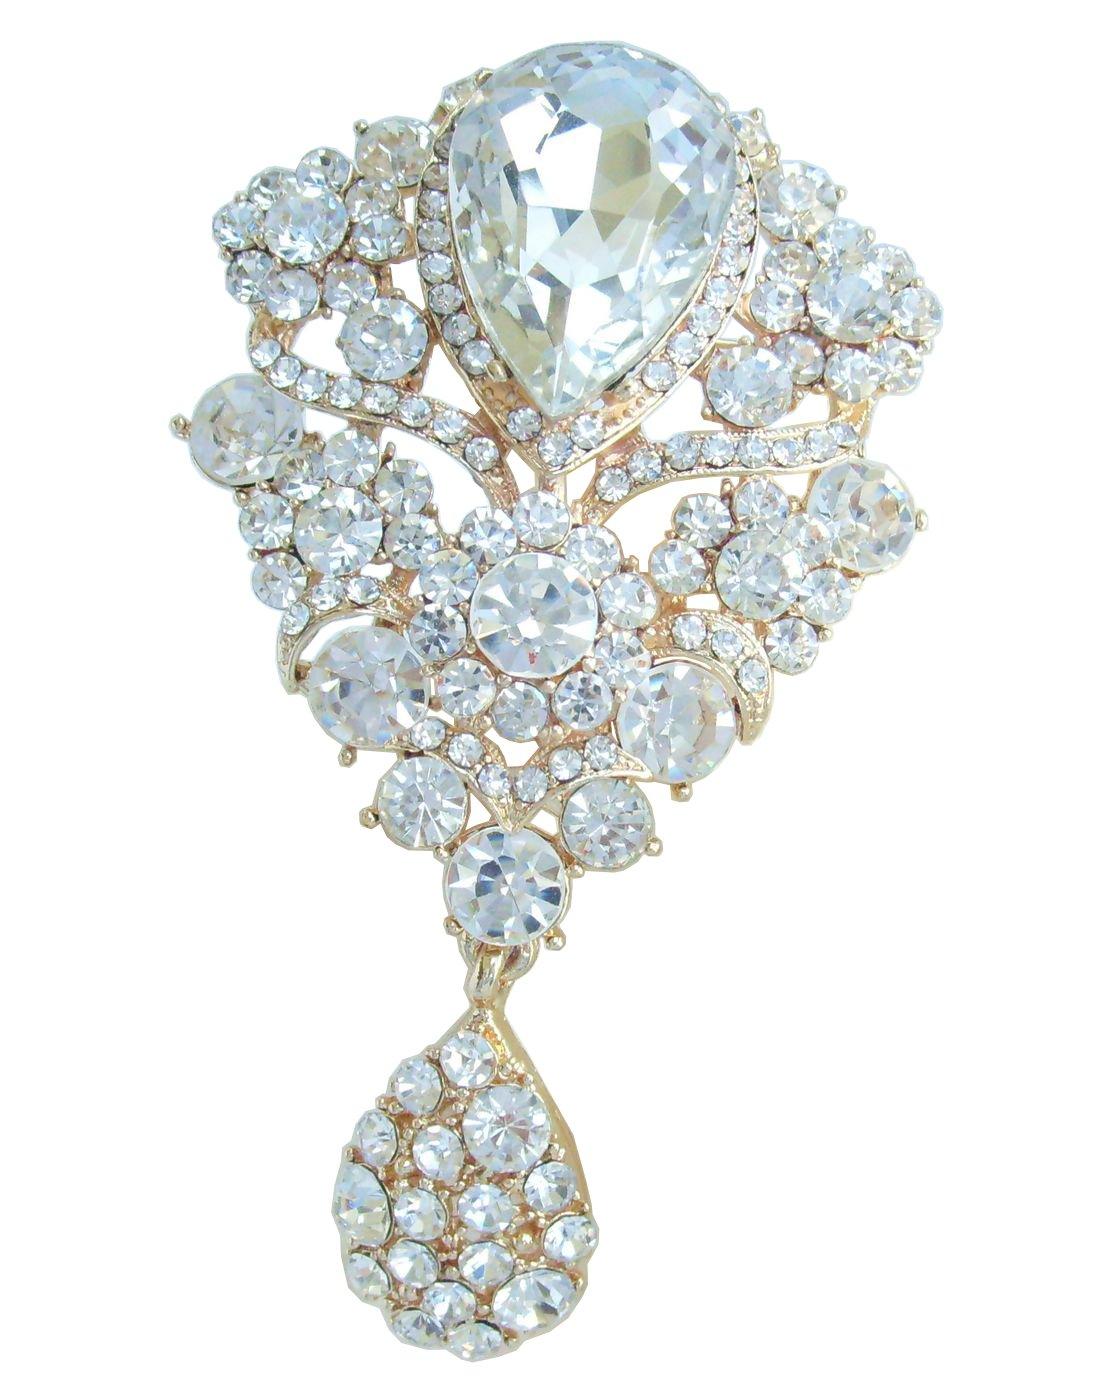 Sindary Wedding 3.94'' Austrian Crystal Flower Brooch Pin Pendant BZ6024 (Gold-Tone Clear)